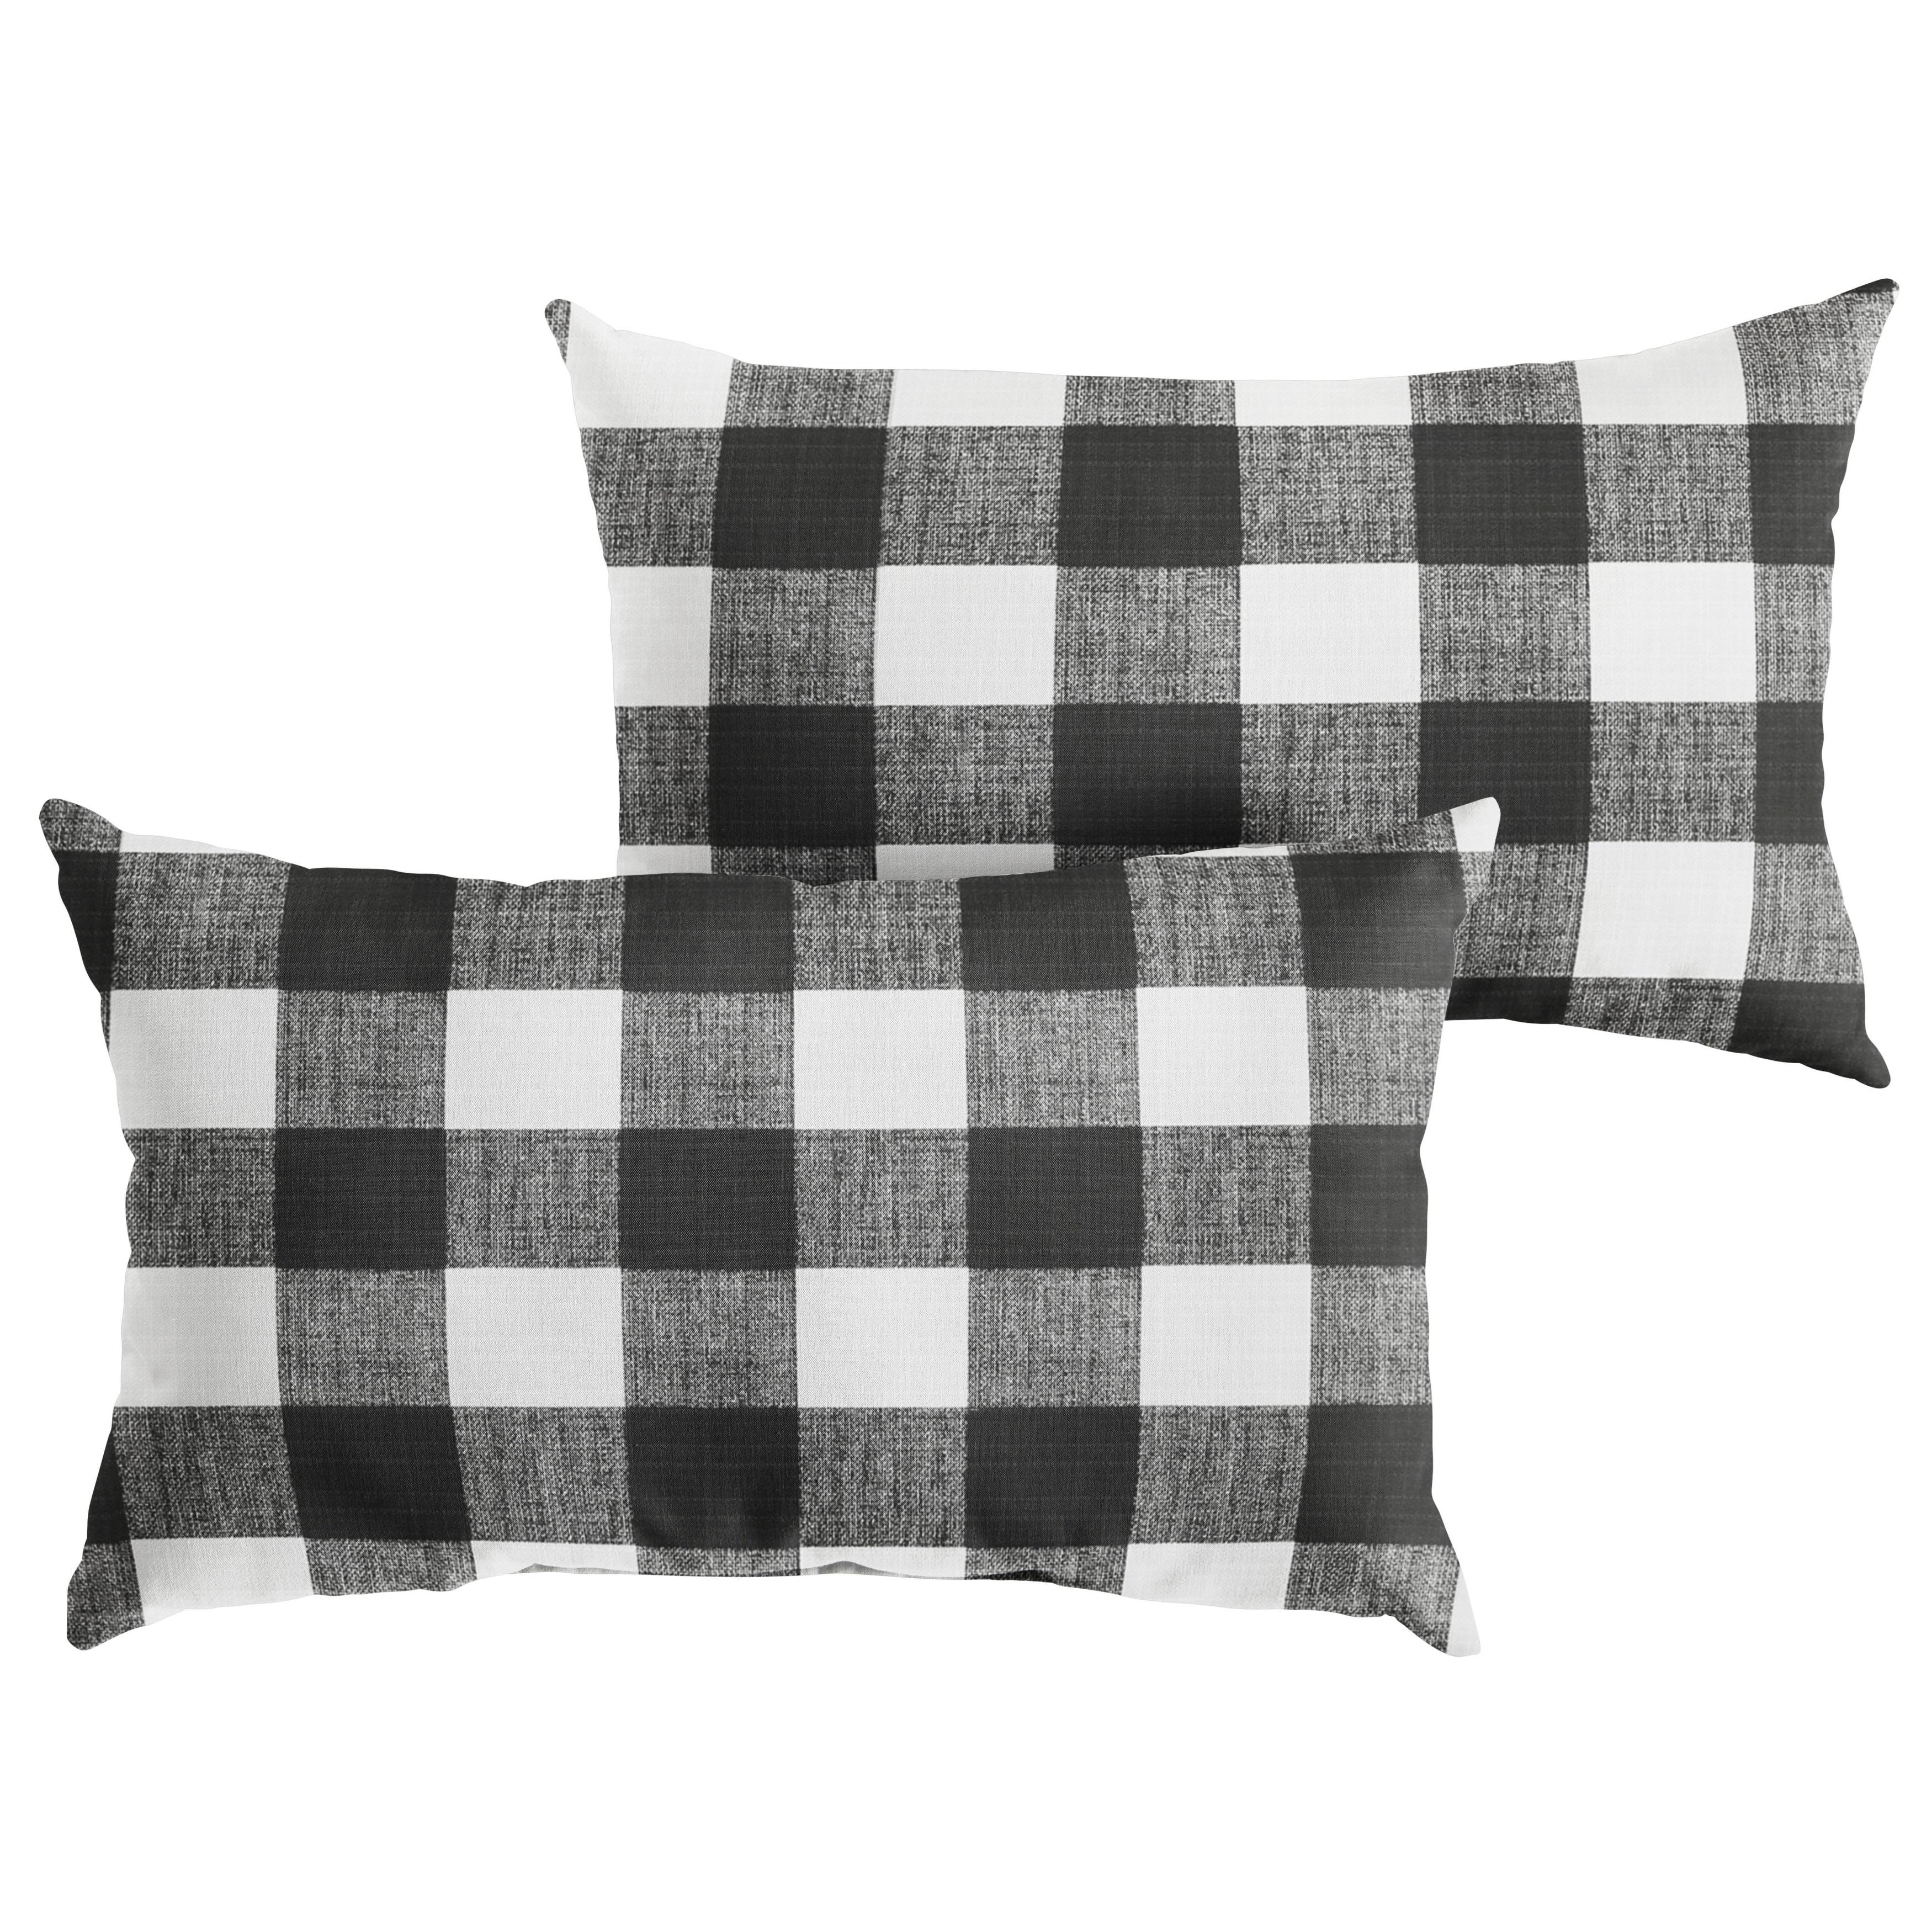 Humble Haute Black Buffalo Plaid Indoor Outdoor Lumbar Pillow Set Of 2 On Sale Overstock 21033830